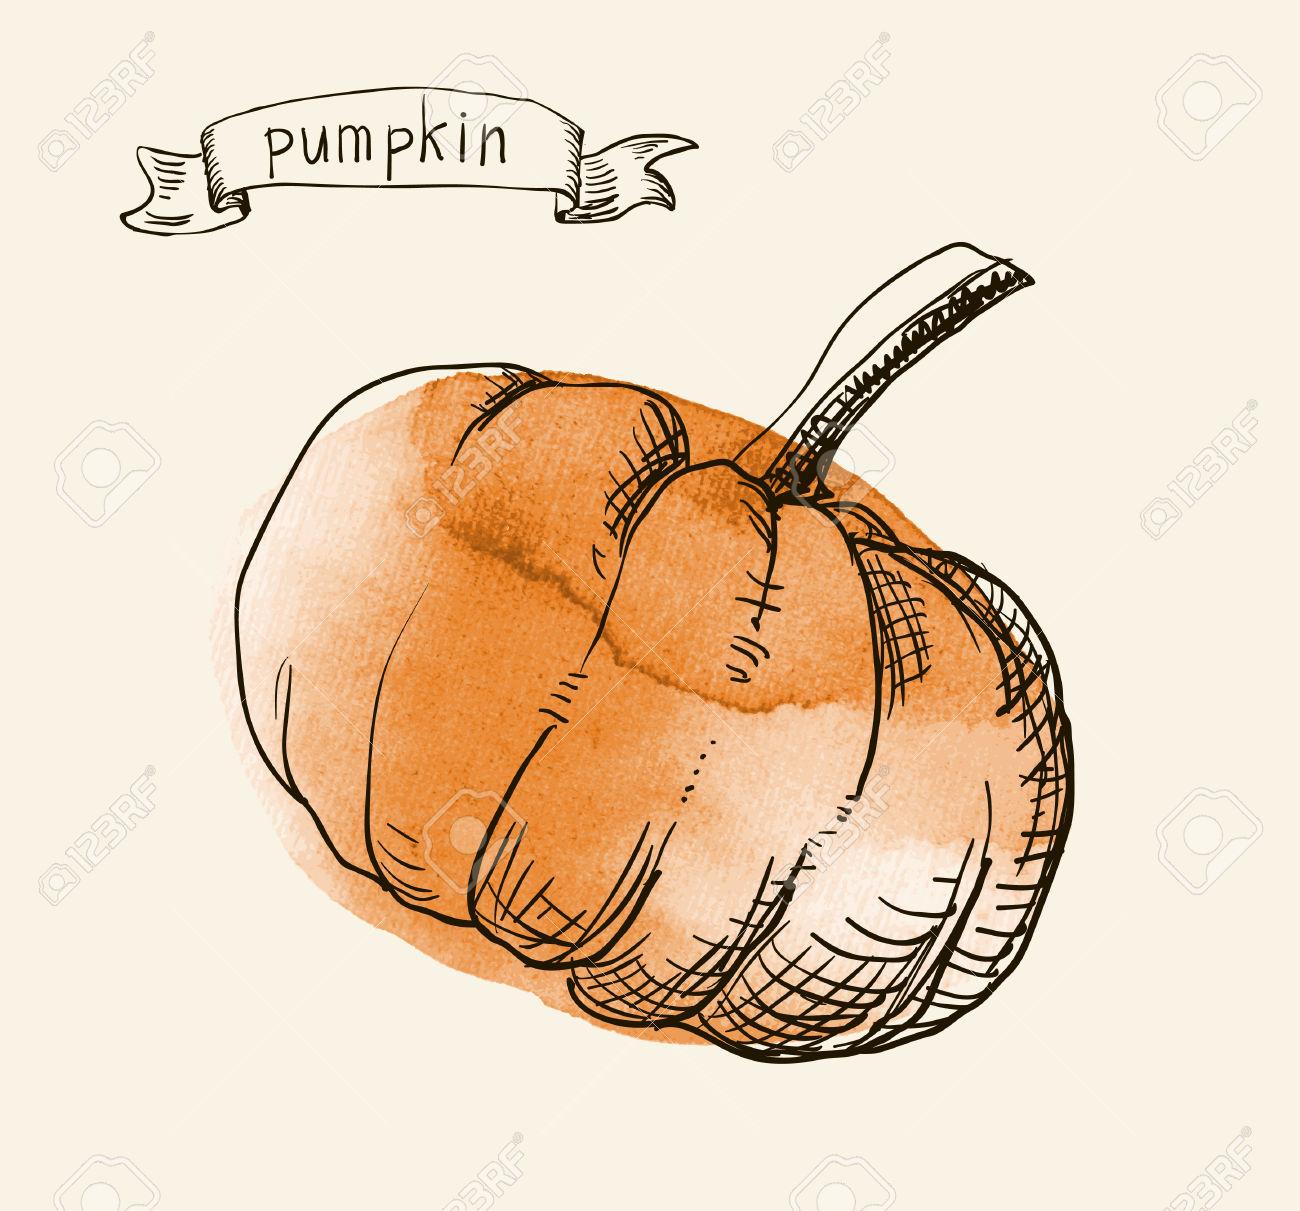 Vector Watercolor Hand Drawn Vintage Illustration Of Pumpkin.